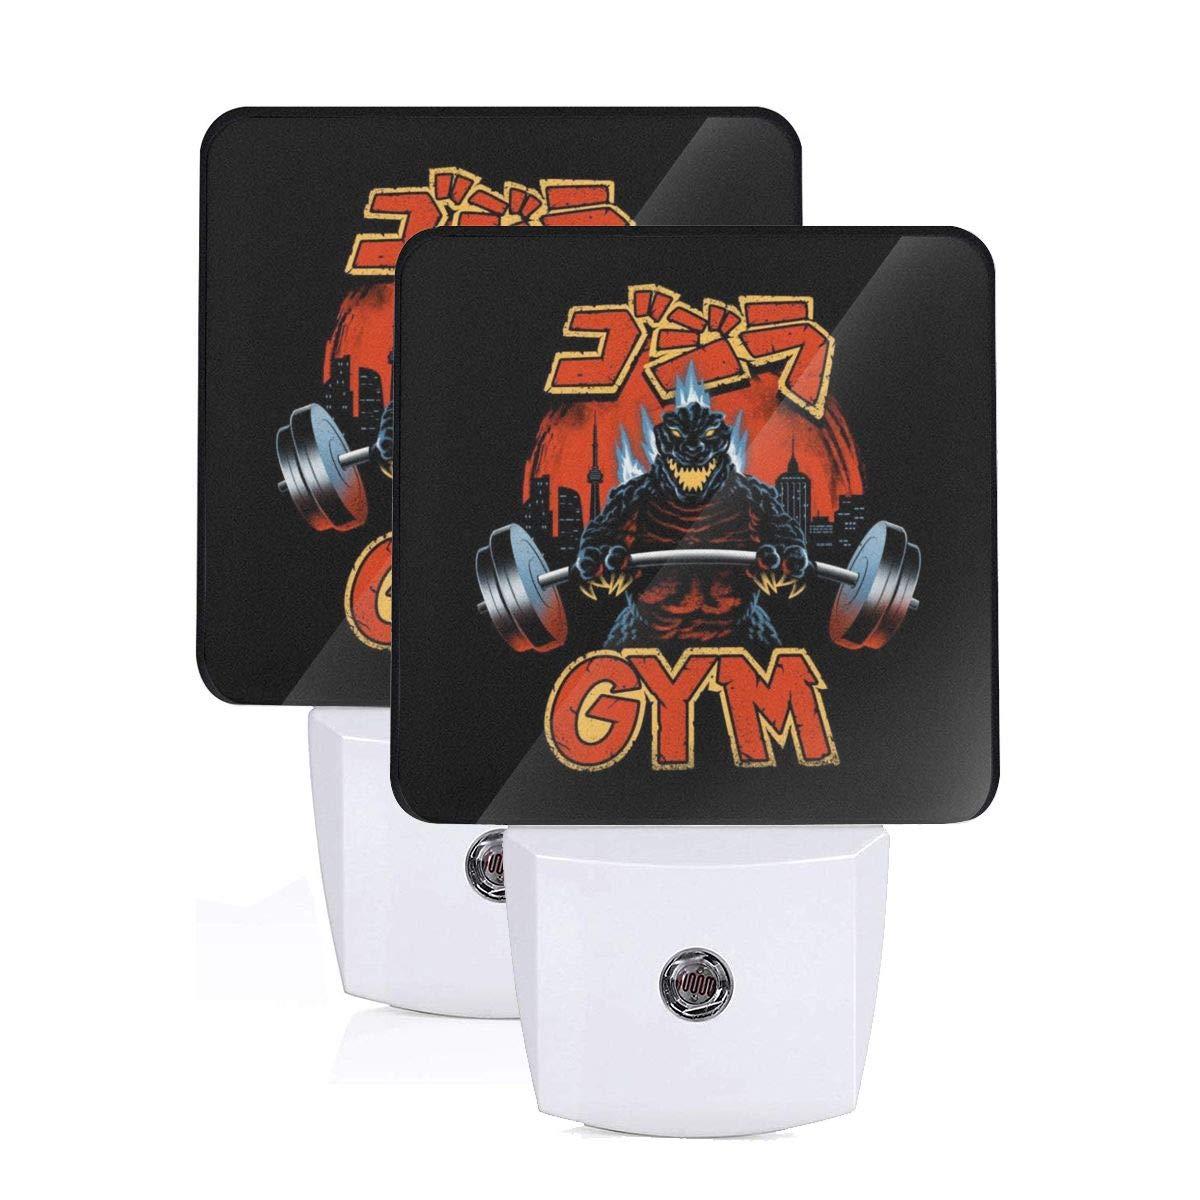 Zilla Gym Godzilla Plug-in Led Night Light with Auto Dusk to Dawn Sensor,Bedroom, Kids Room, Kitchen, Stairway, Adjustable Brightness 2 Pack